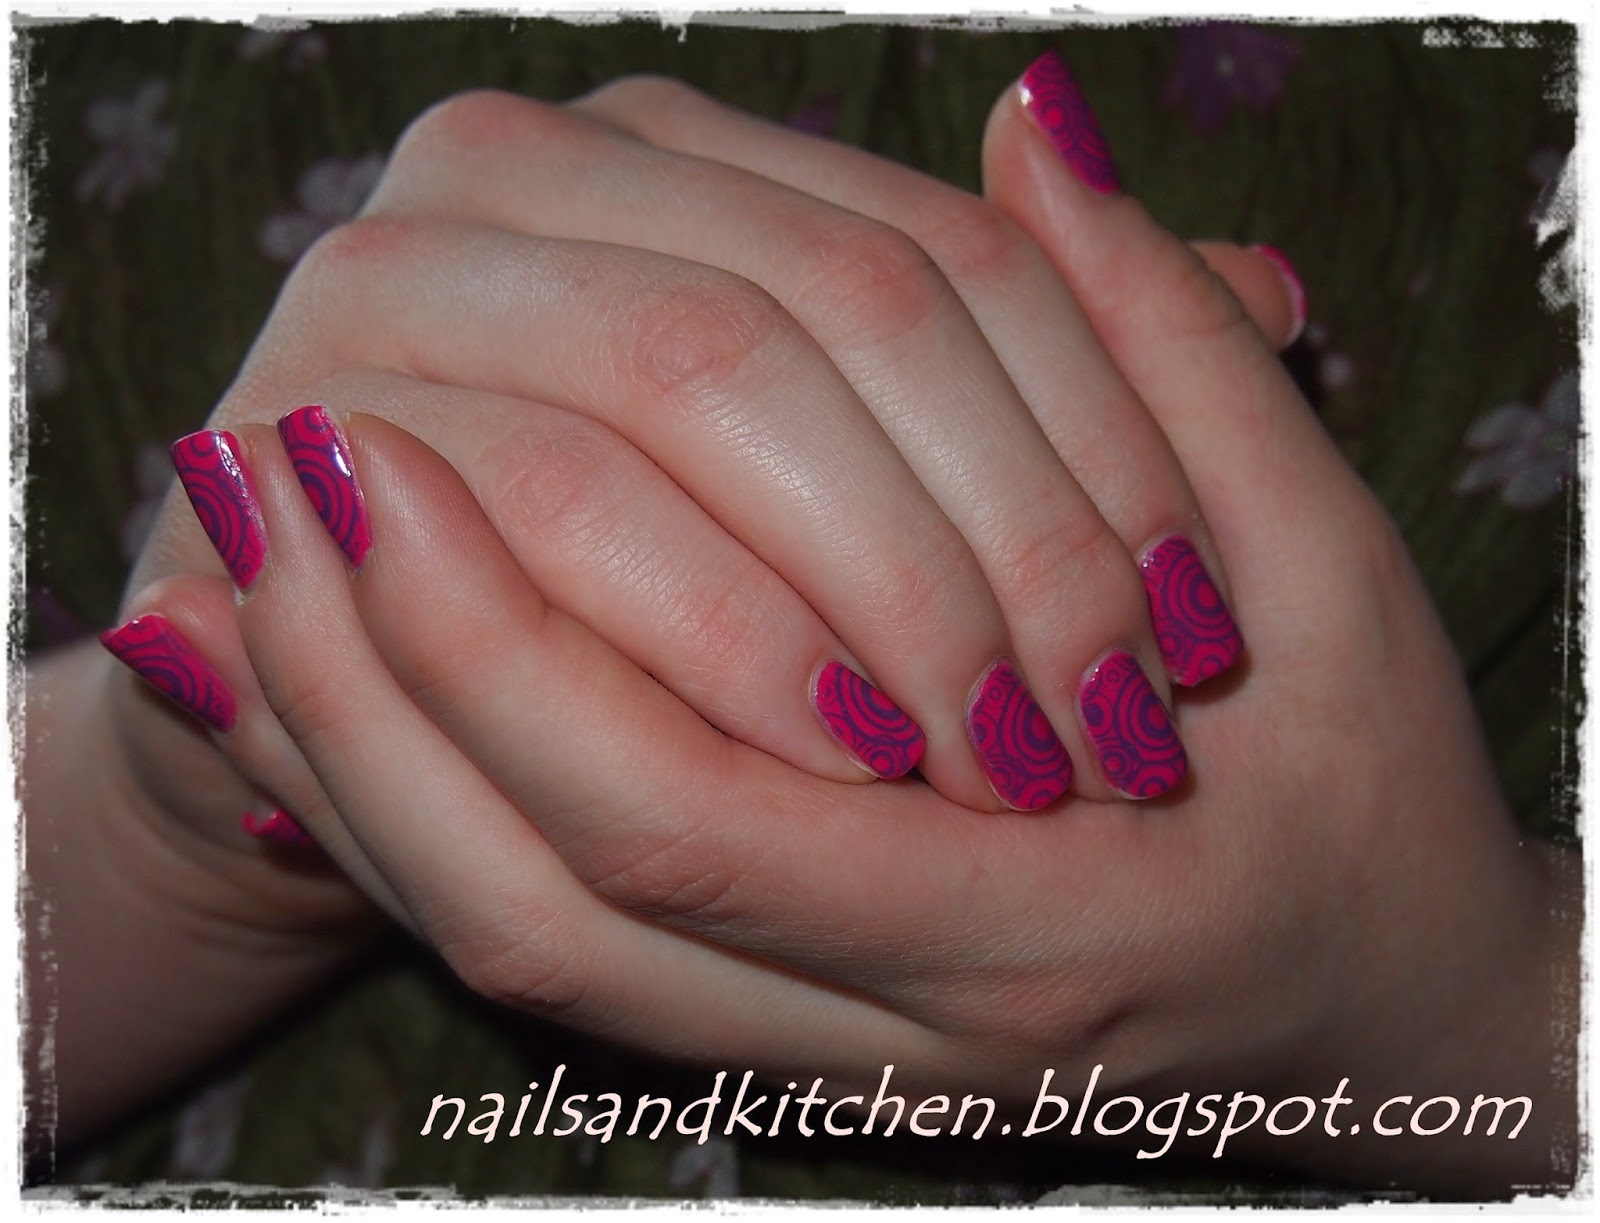 http://nailsandkitchen.blogspot.com/2014/06/niespodziewane-polaczenie.html